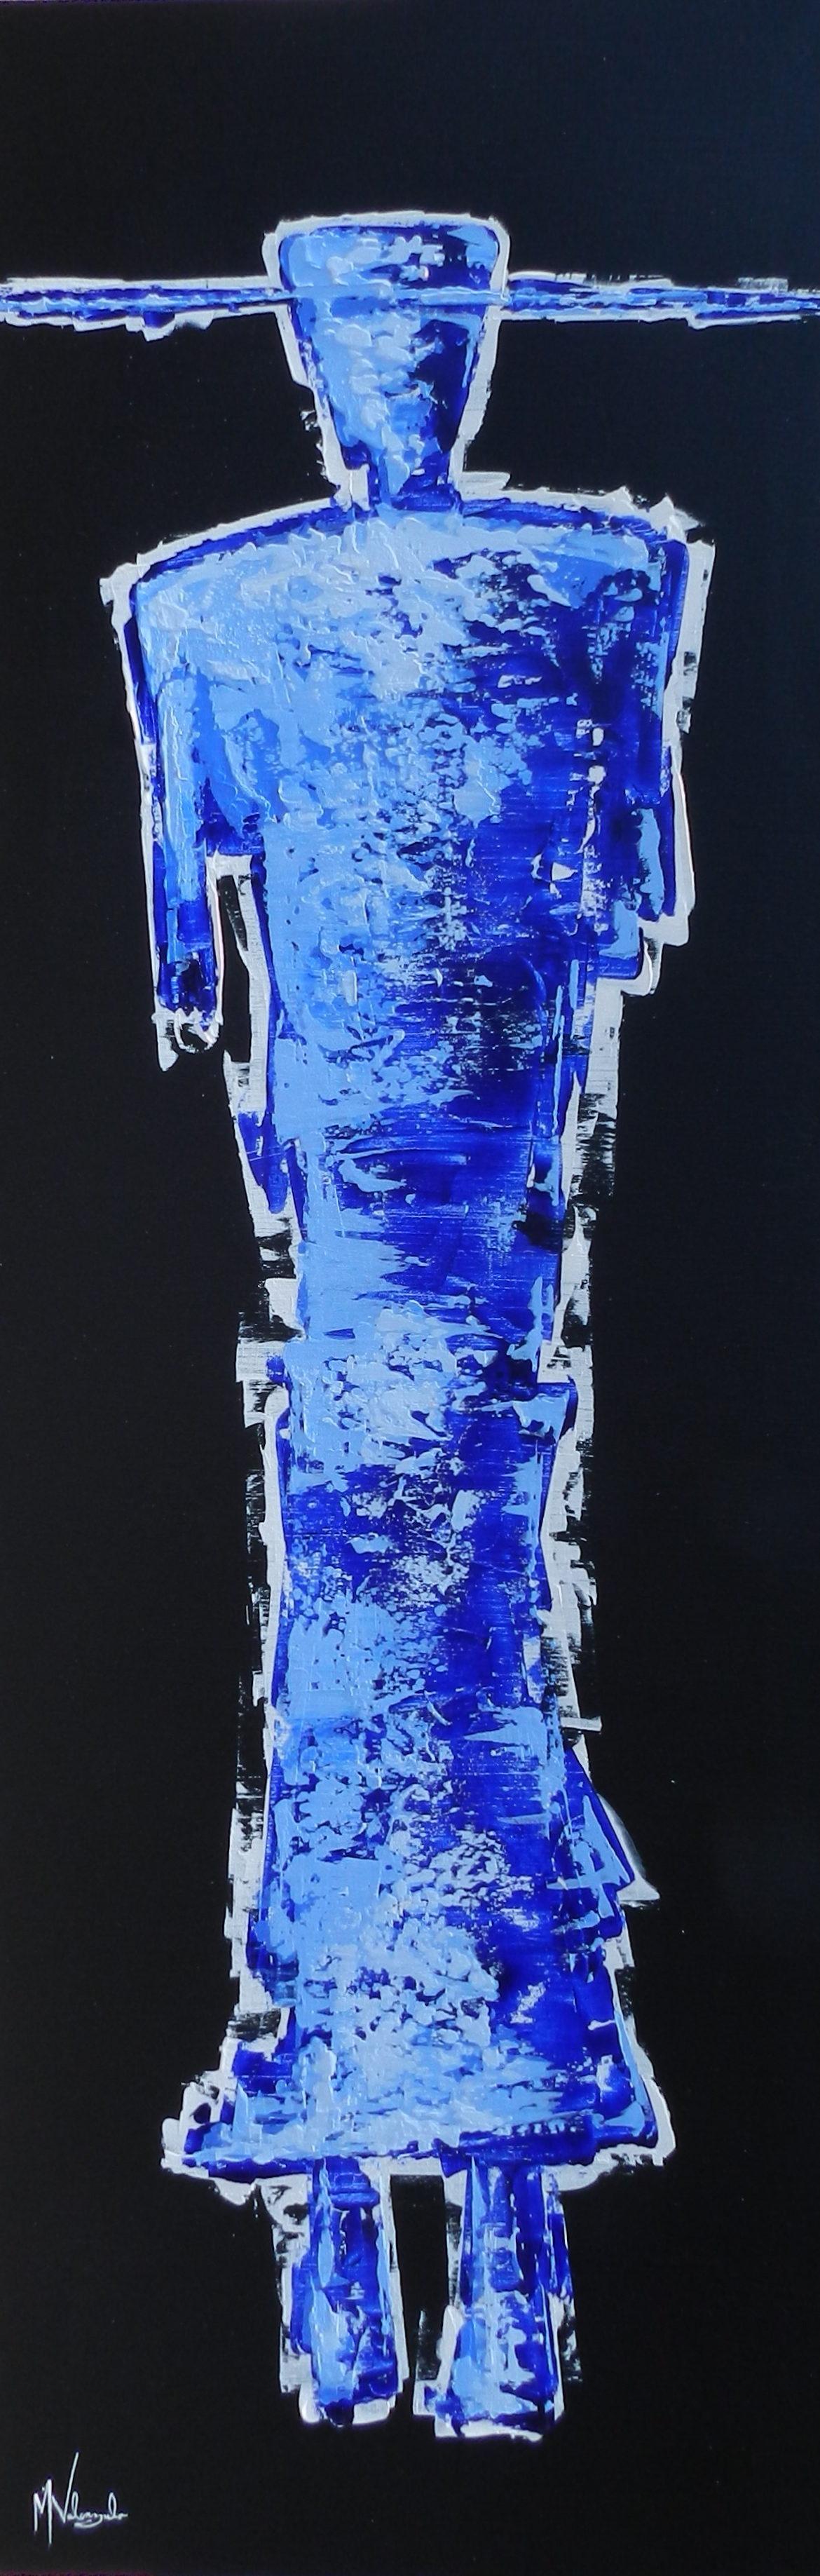 Mr. Blue, Manny Valenzuela, Painting, Rogoway Gallery